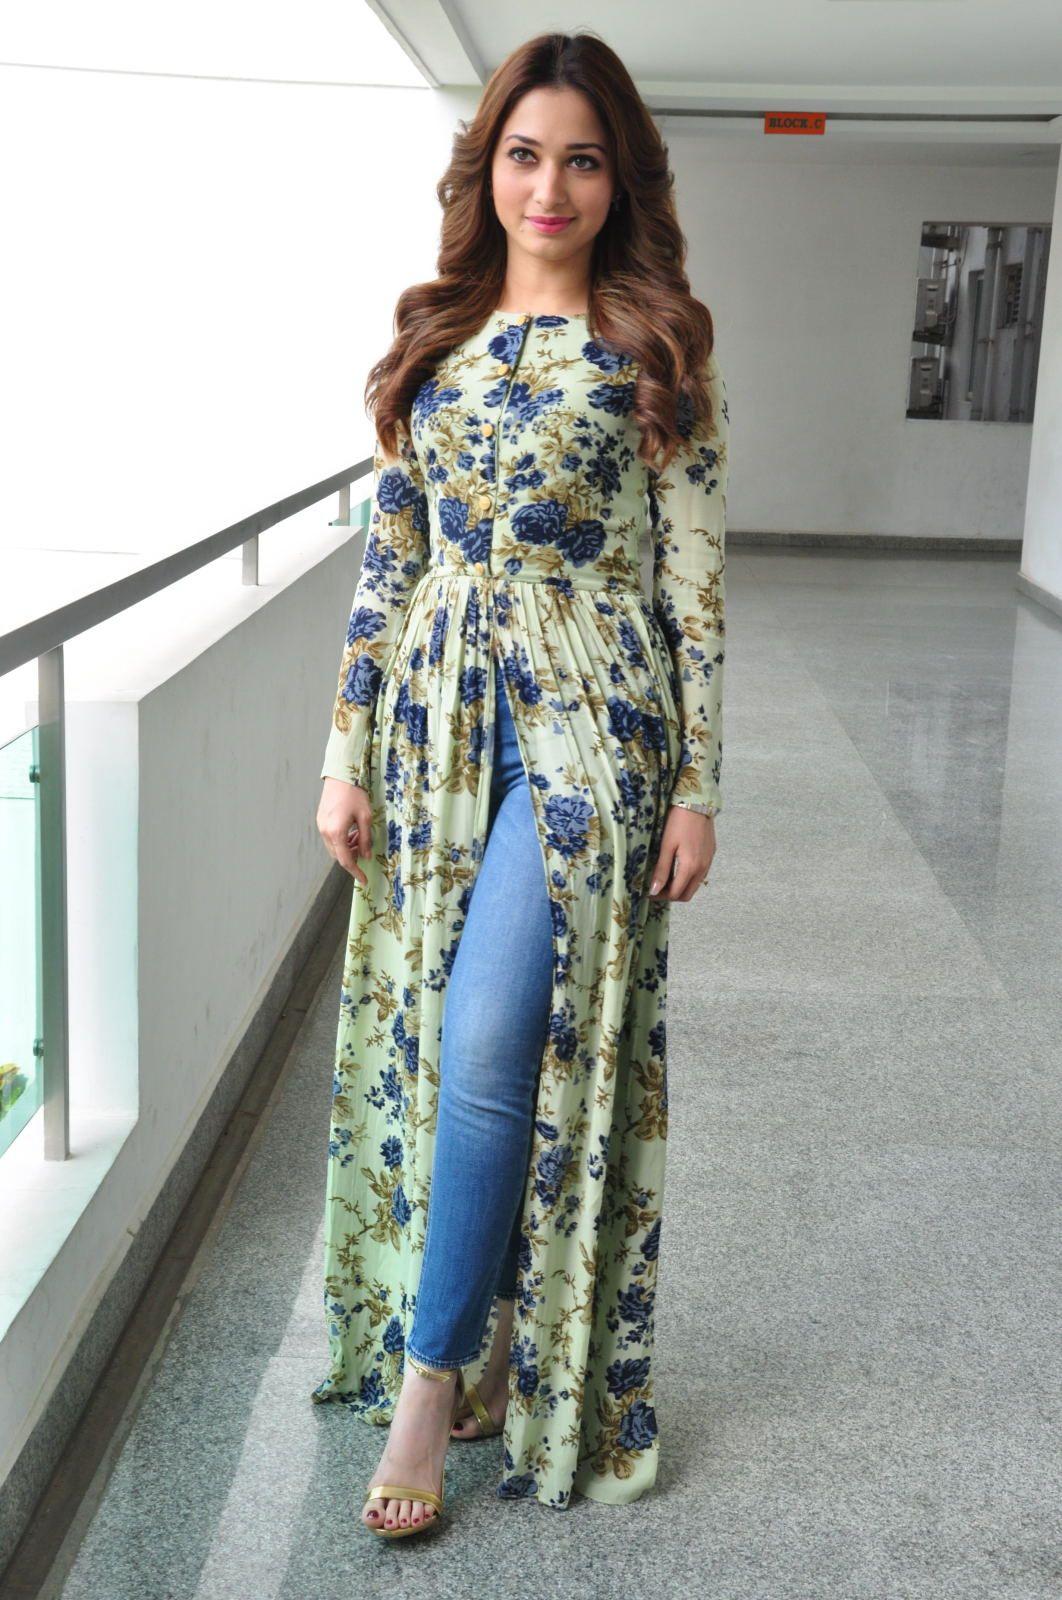 Tamanna Stills at Baahubali Promotions | Long dress design, Indian fashion  dresses, Kurta designs women